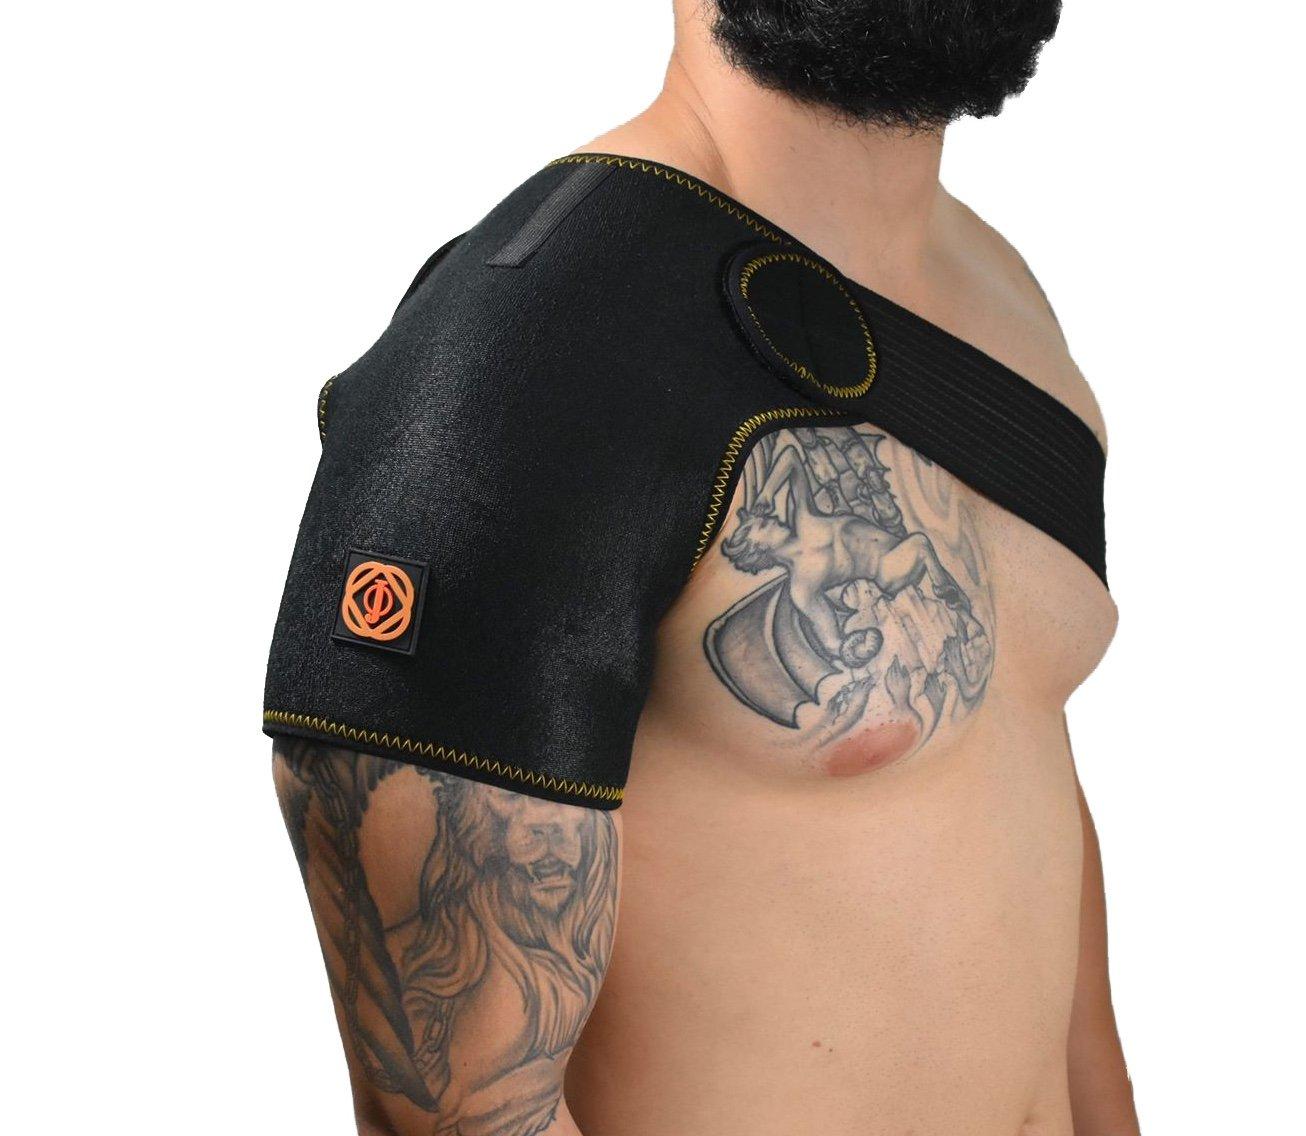 Shoulder Brace by Jupiter Orbit- Shoulder Support Brace for Compression, Shoulder Brace Support for Men and Women, Rotator Cuff Support for Injury Prevention, Sprain and Soreness